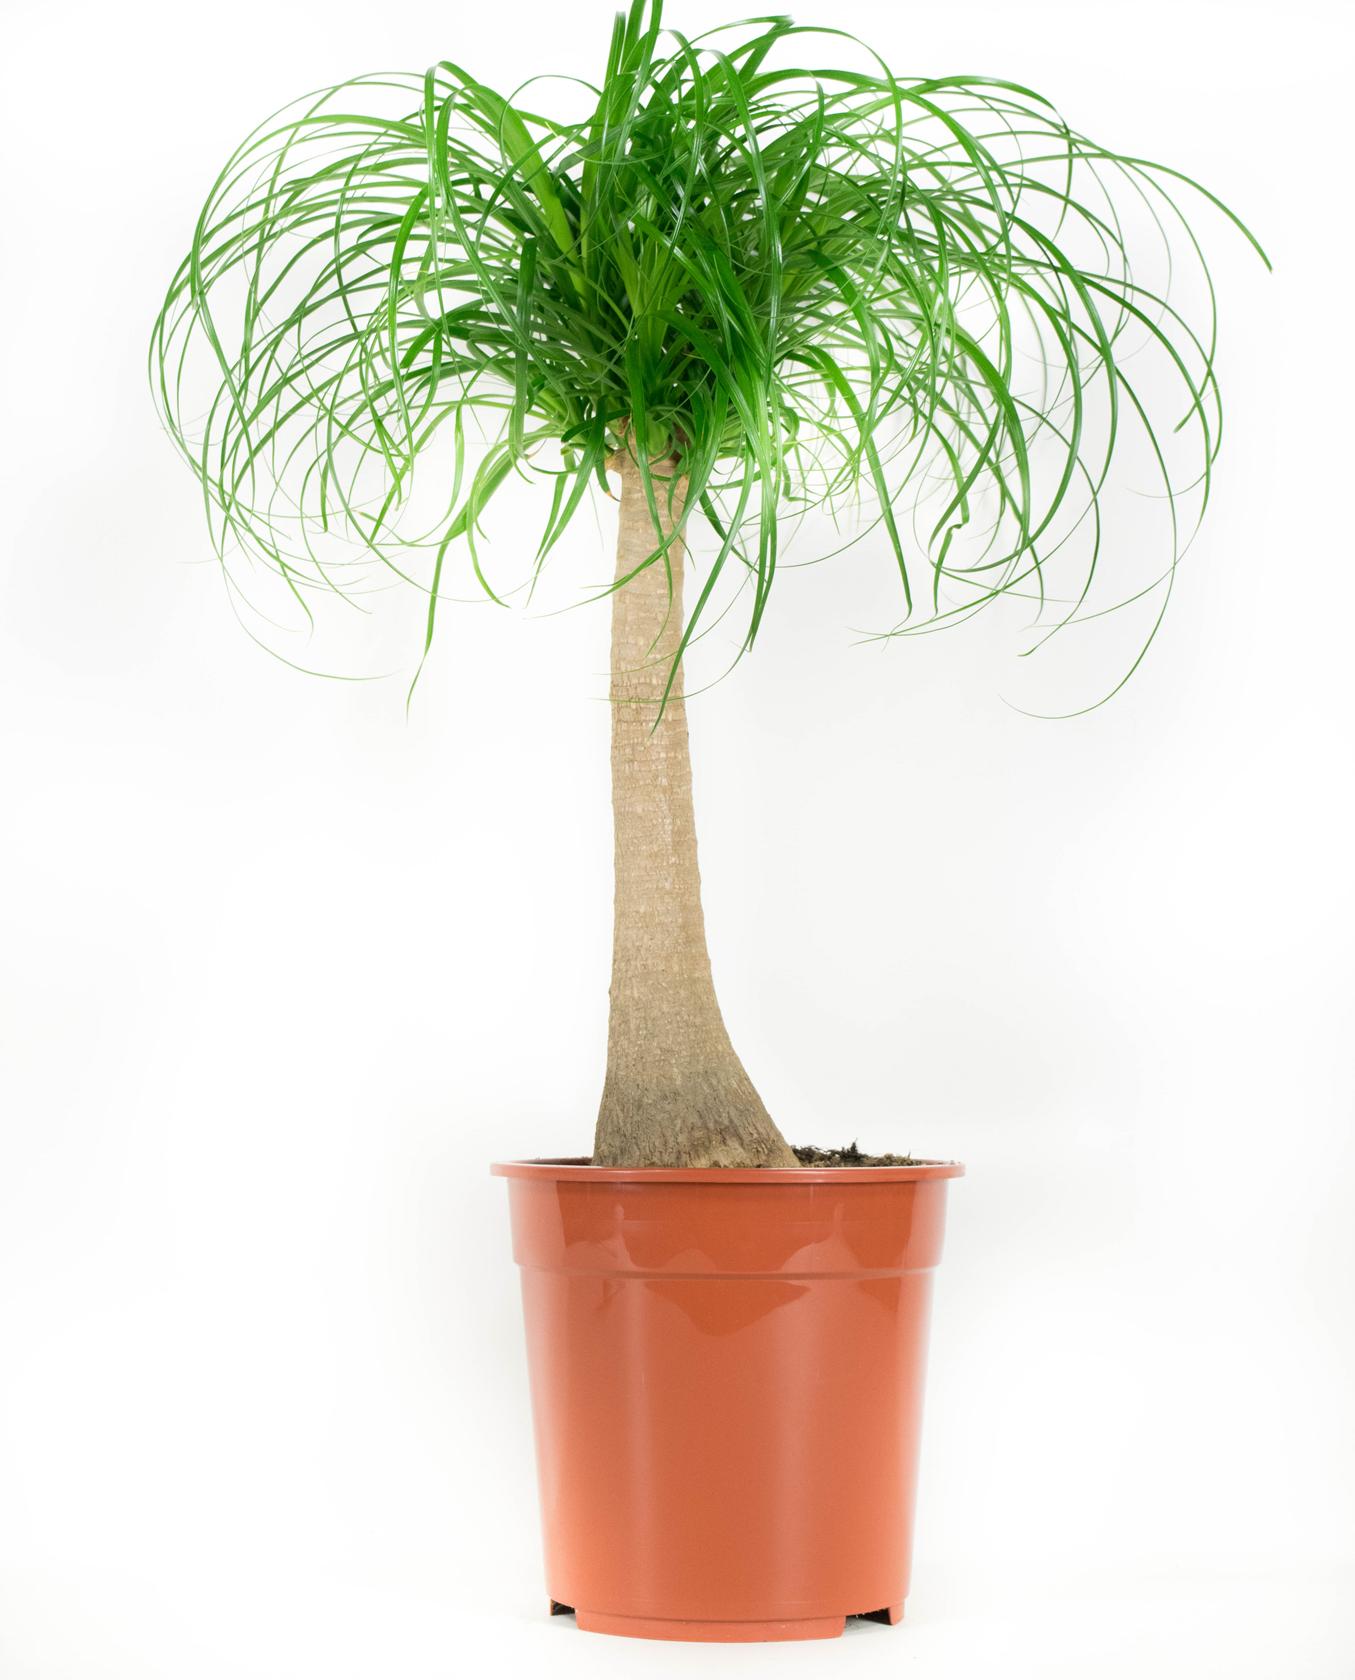 Olifantspoot - Beaucarnea 75 à 80 cm hoog